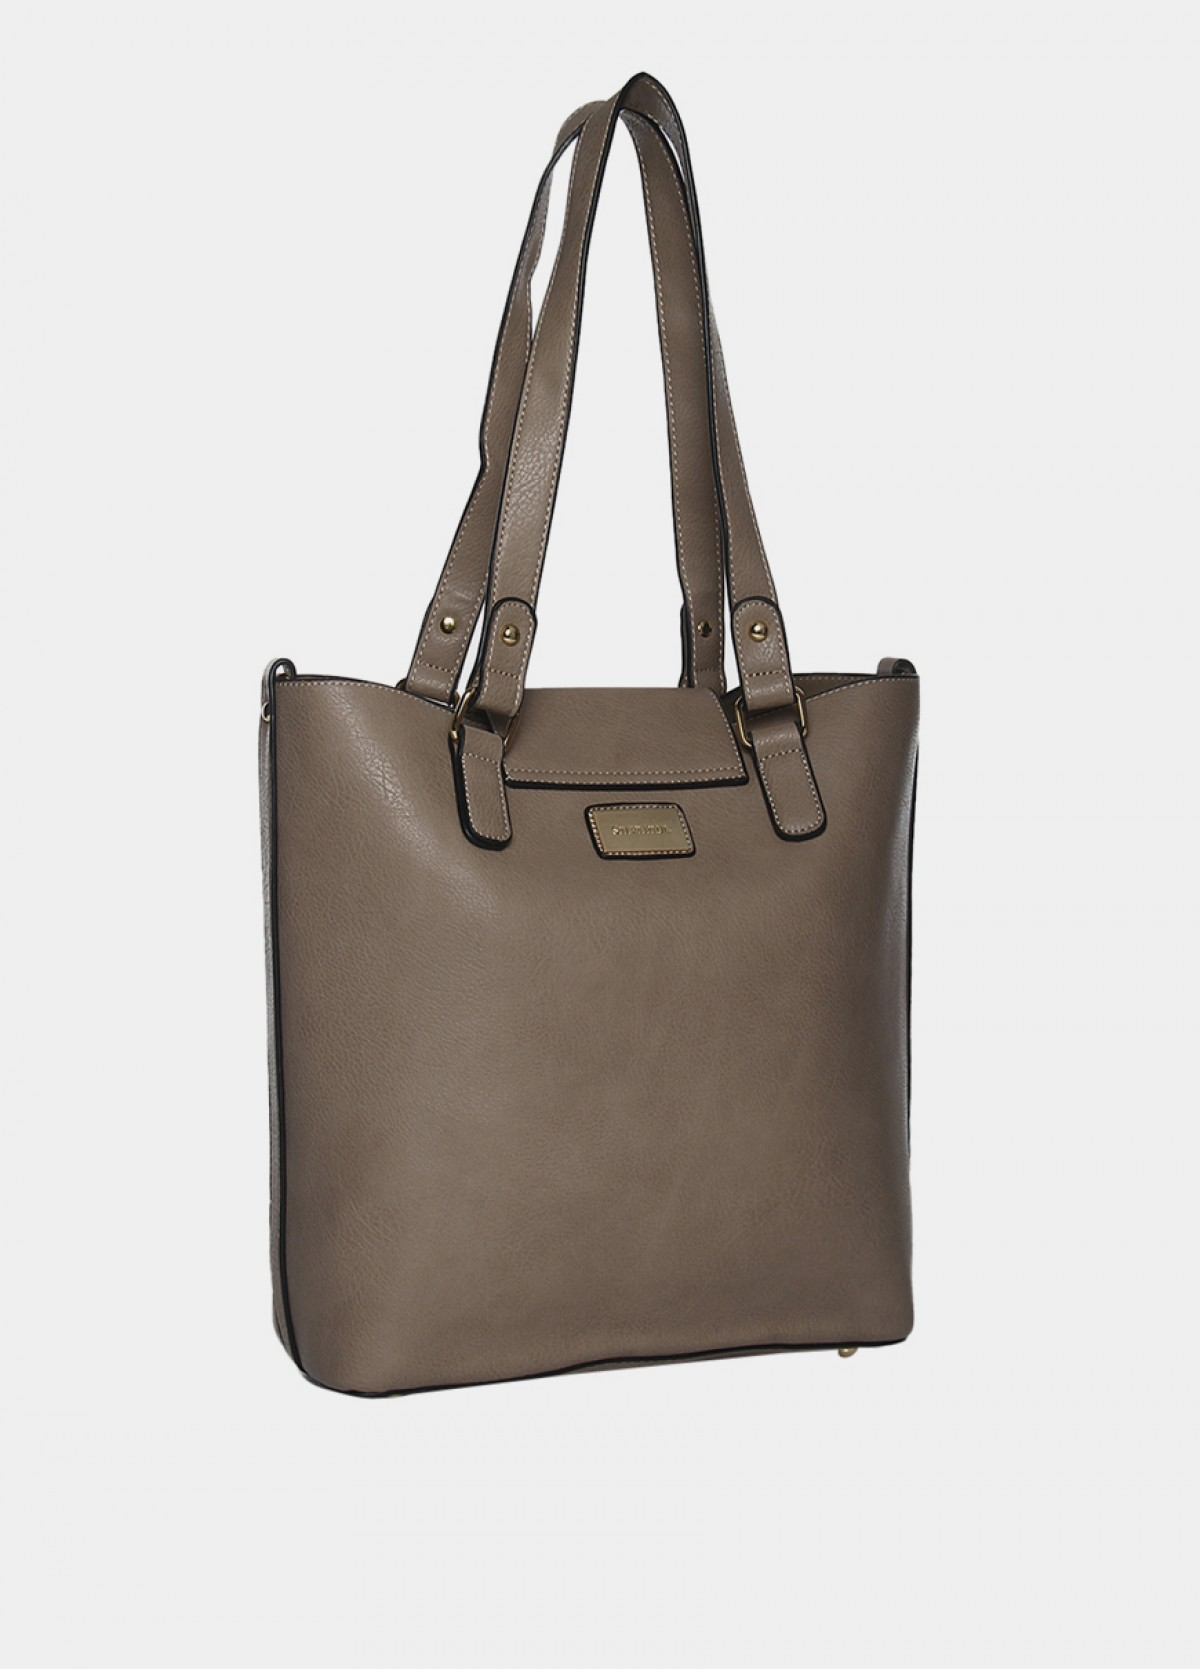 The Taupe Tote Handbag